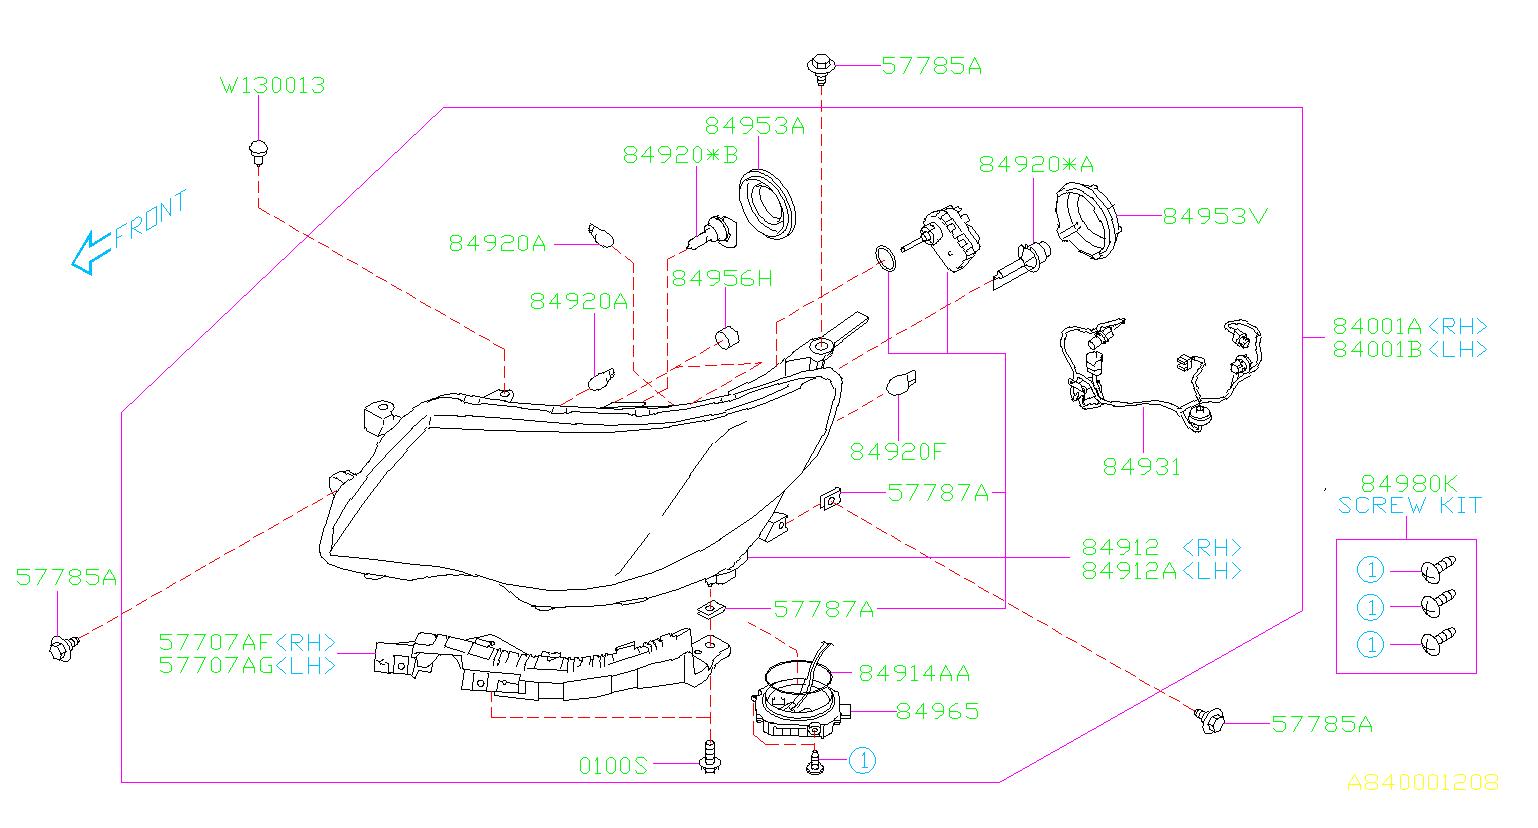 84931sc030 - Headlight Wiring Harness